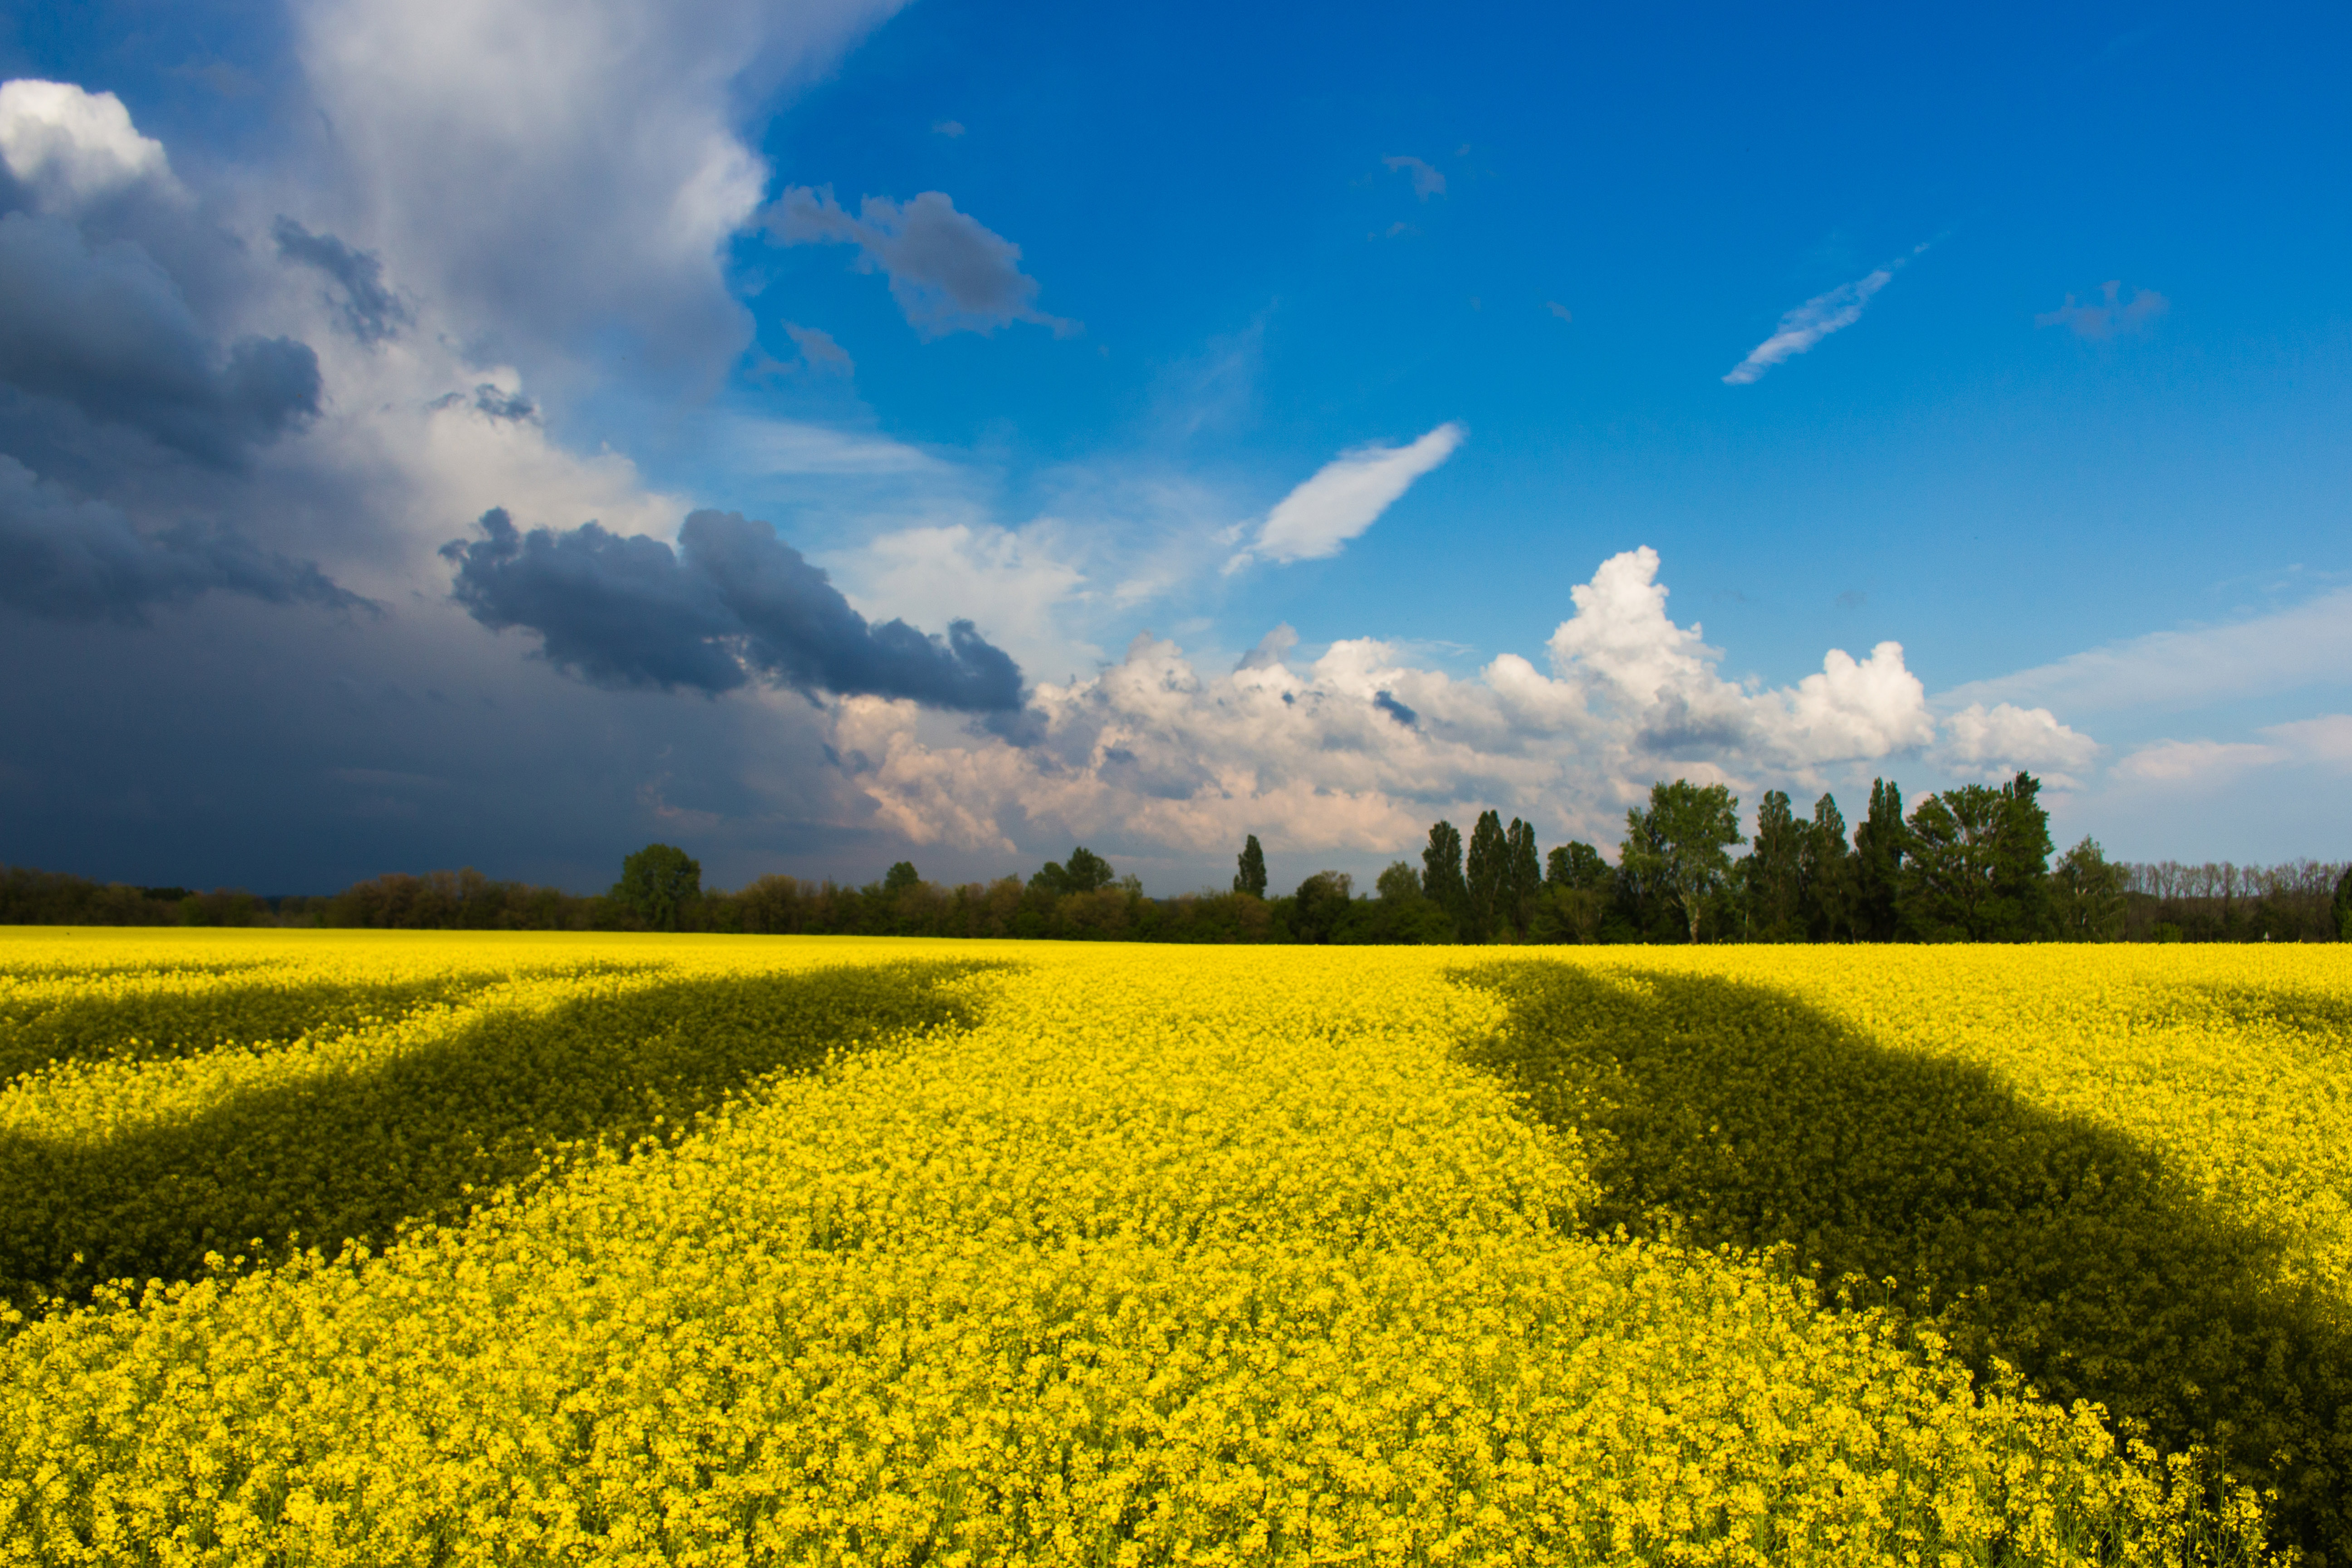 Yellow flower fields in ukraine image free stock photo public free photos ukraine photos other ukraine photos yellow flower fields mightylinksfo